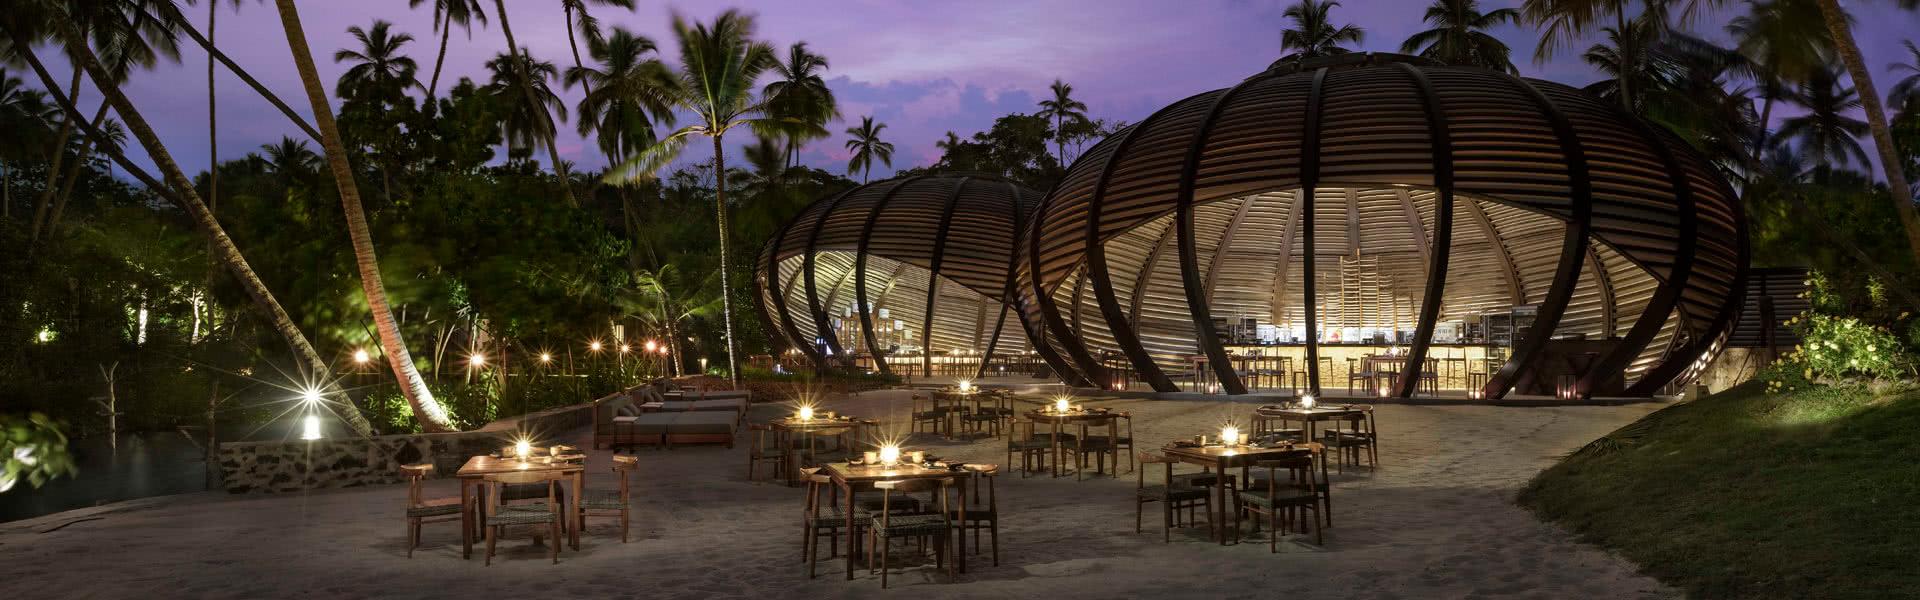 Tangalle Restaurants | Dining at Anantara Peace Haven